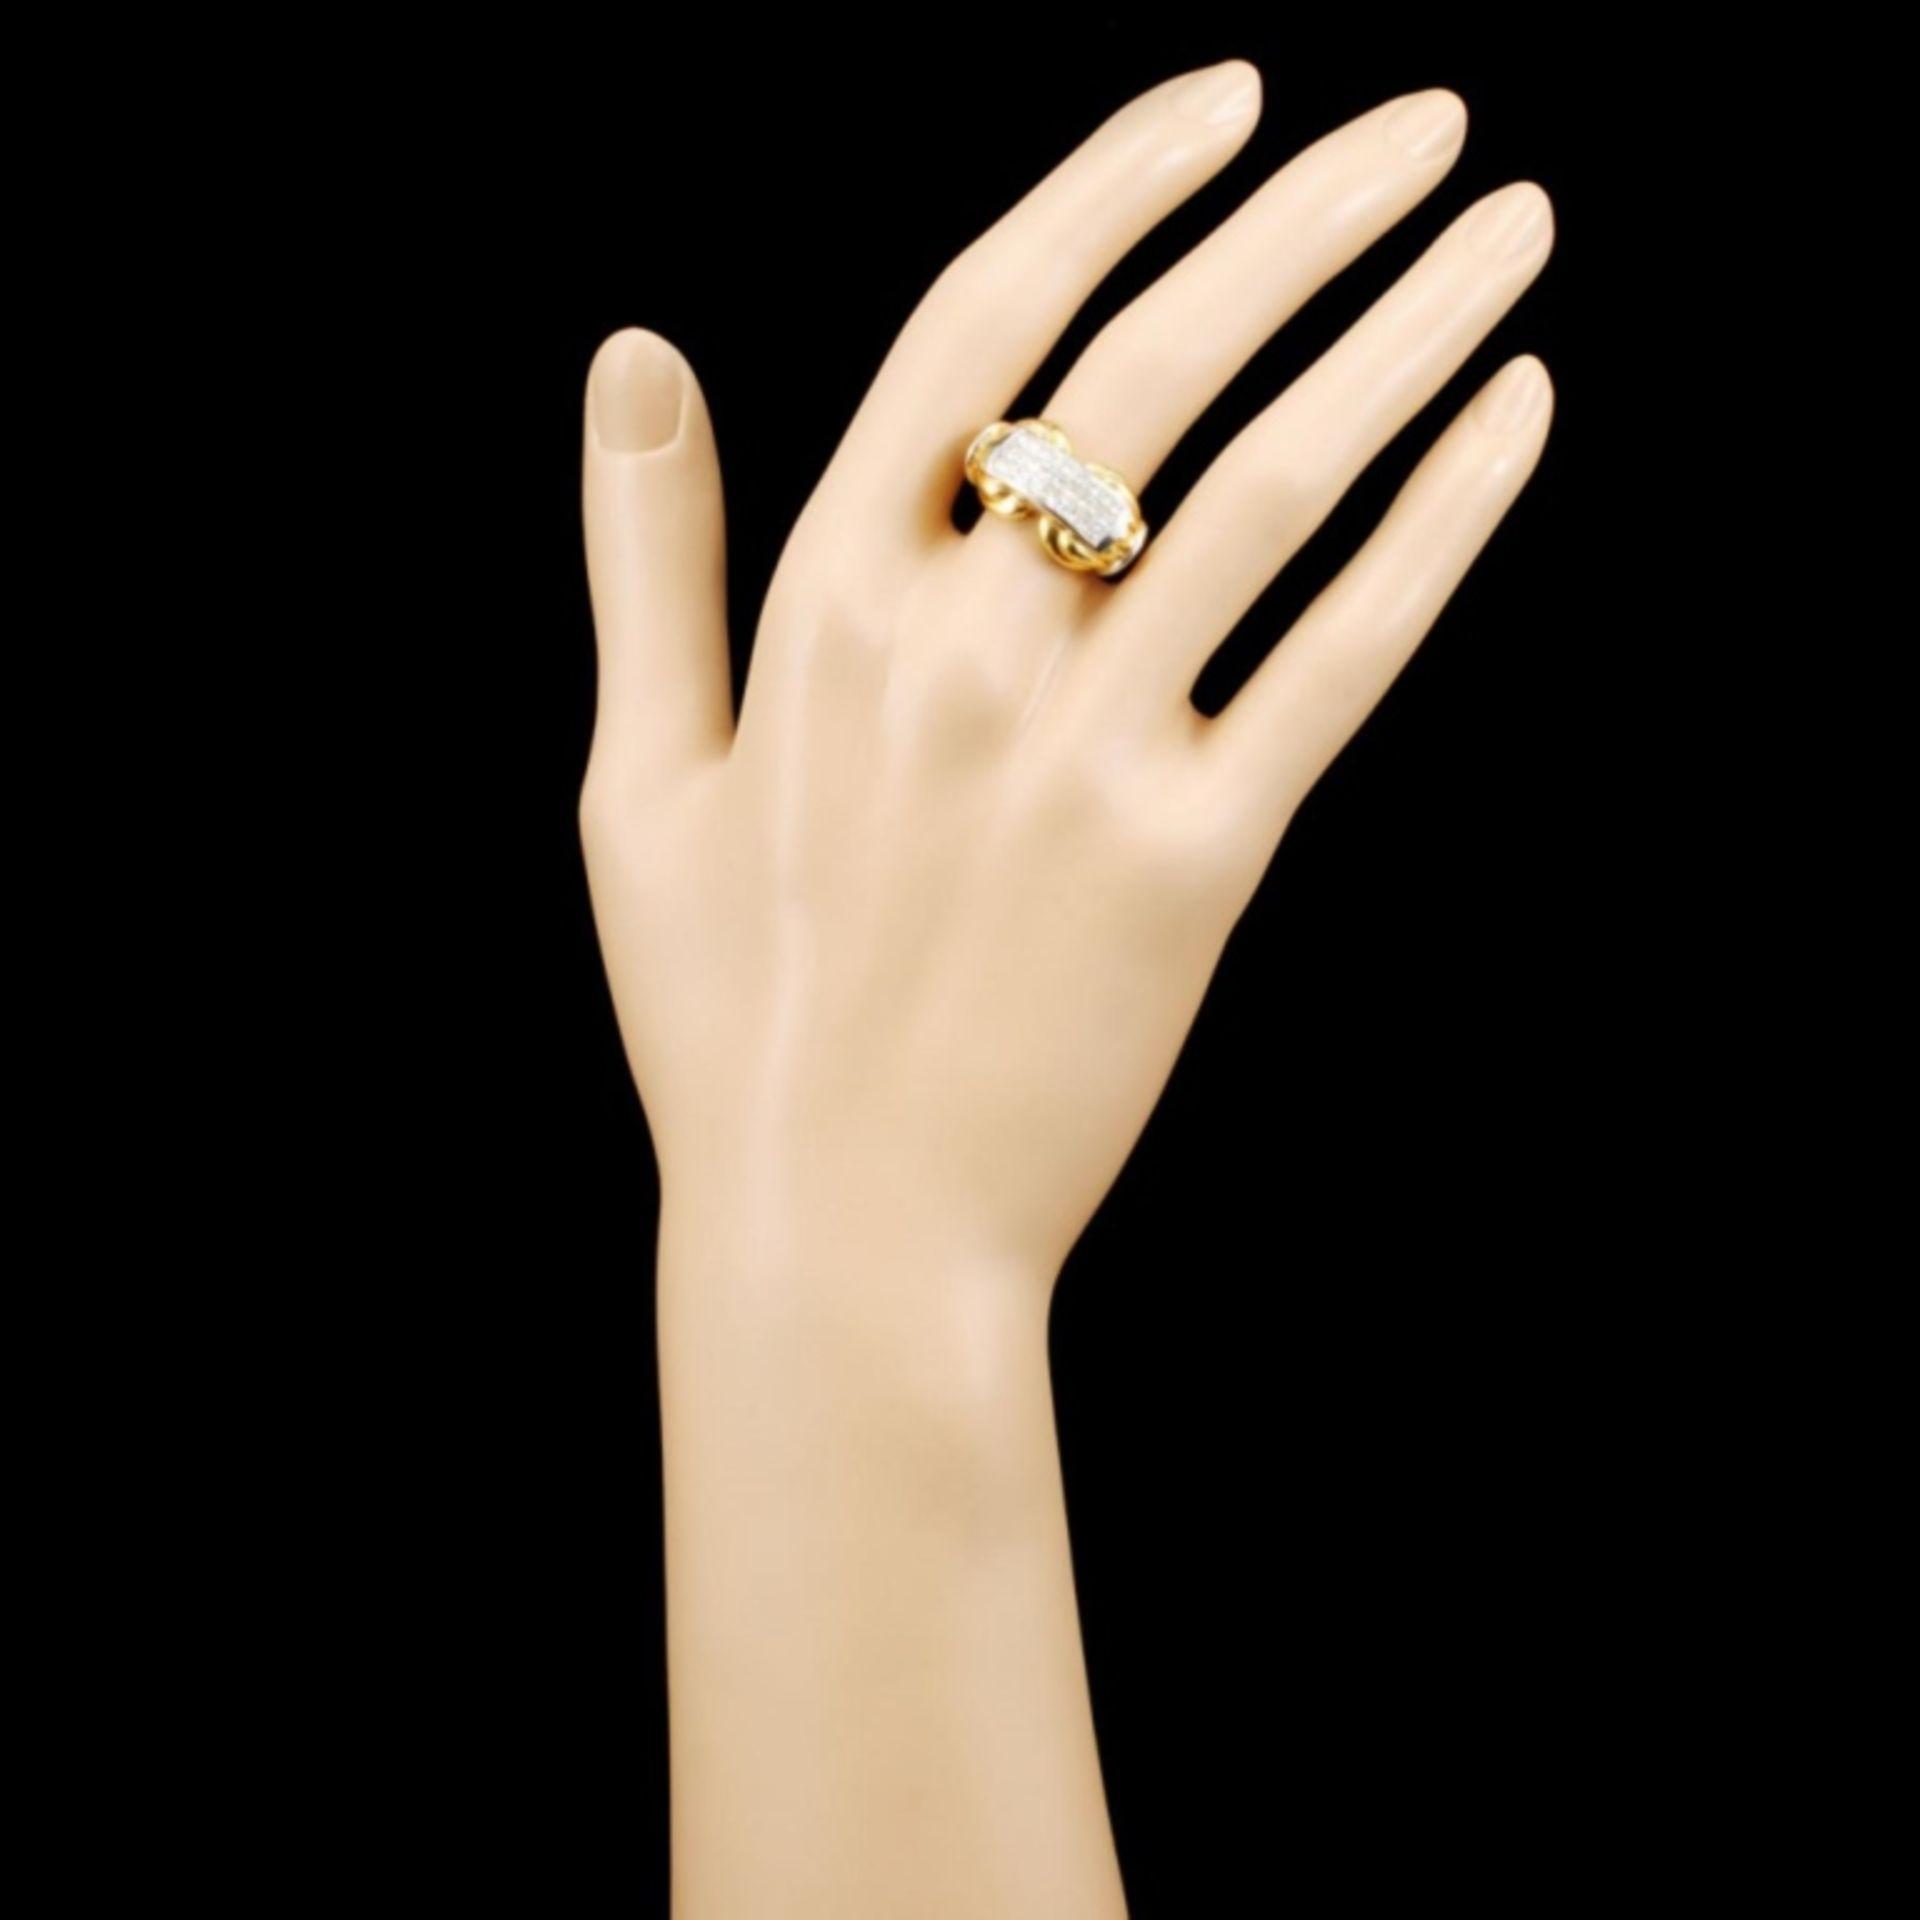 18K Gold 1.29ctw Diamond Ring - Image 4 of 4